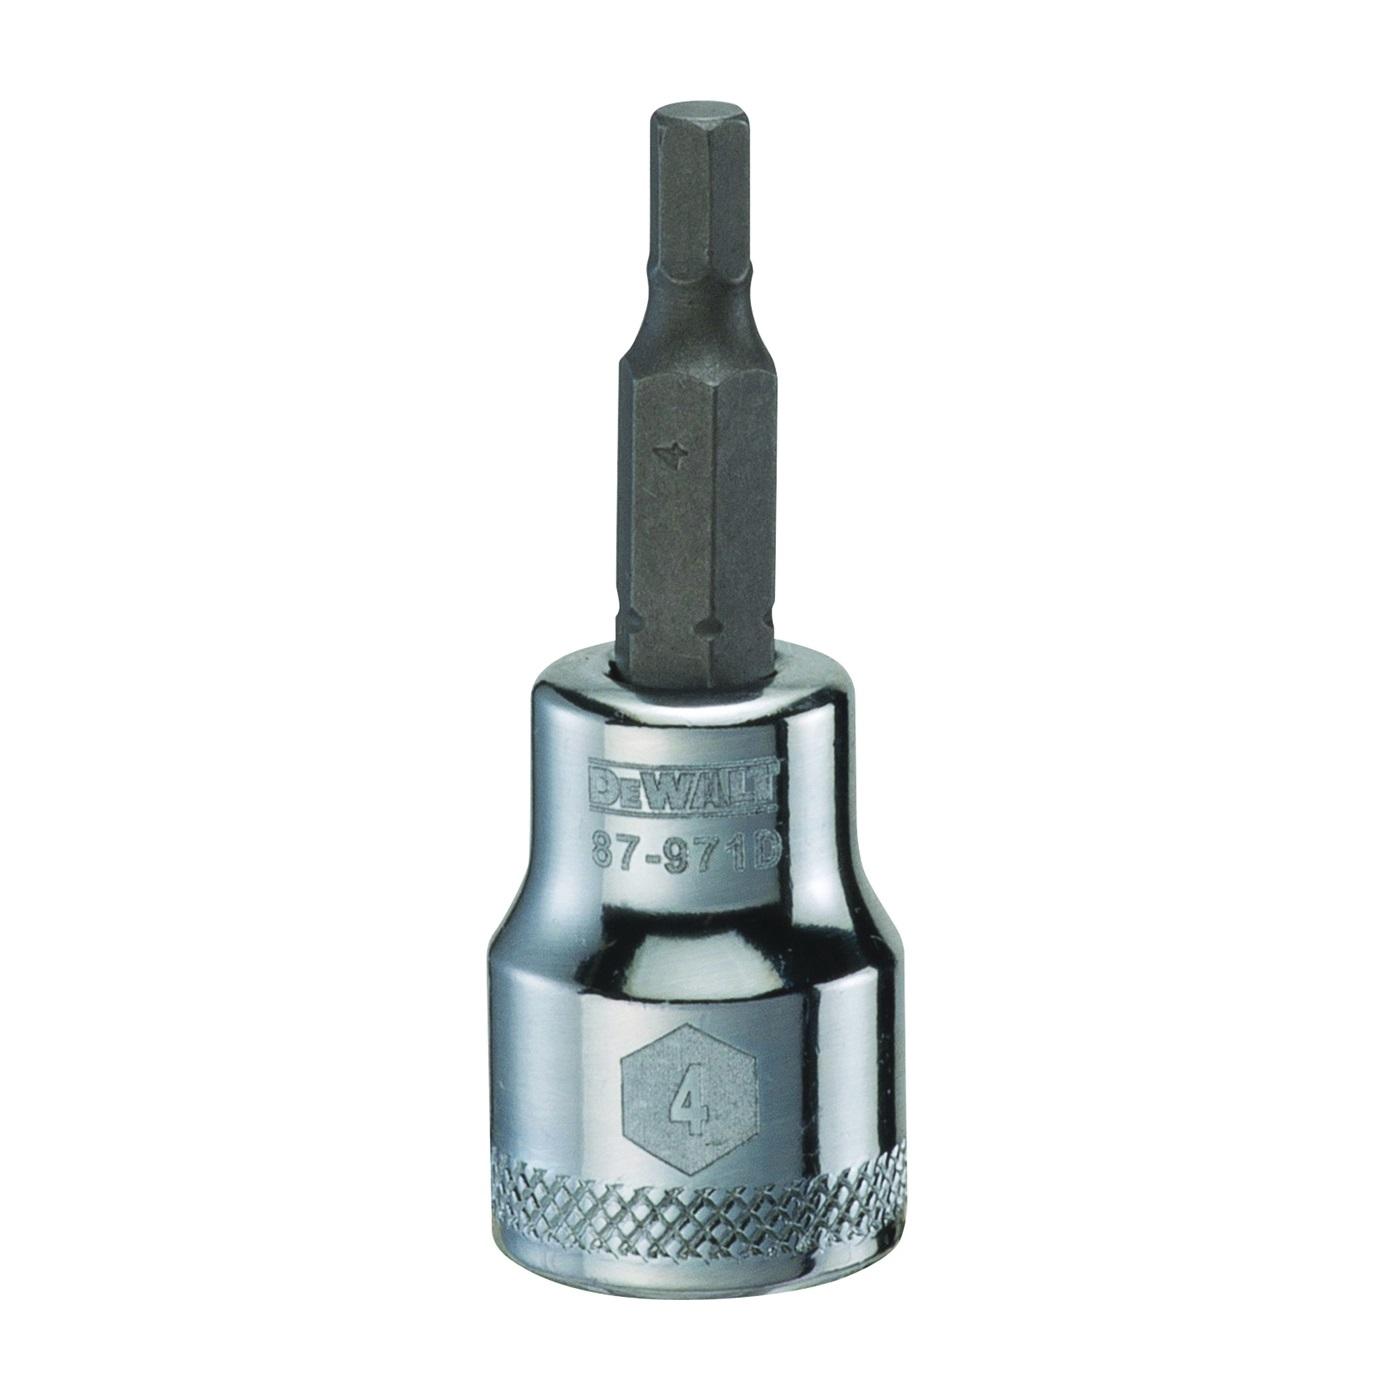 Picture of DeWALT DWMT87971OSP Fractional Hex Bit Socket, 4 mm Tip, 3/8 in Drive, Polished Chrome Vanadium, 1-31/32 in OAL